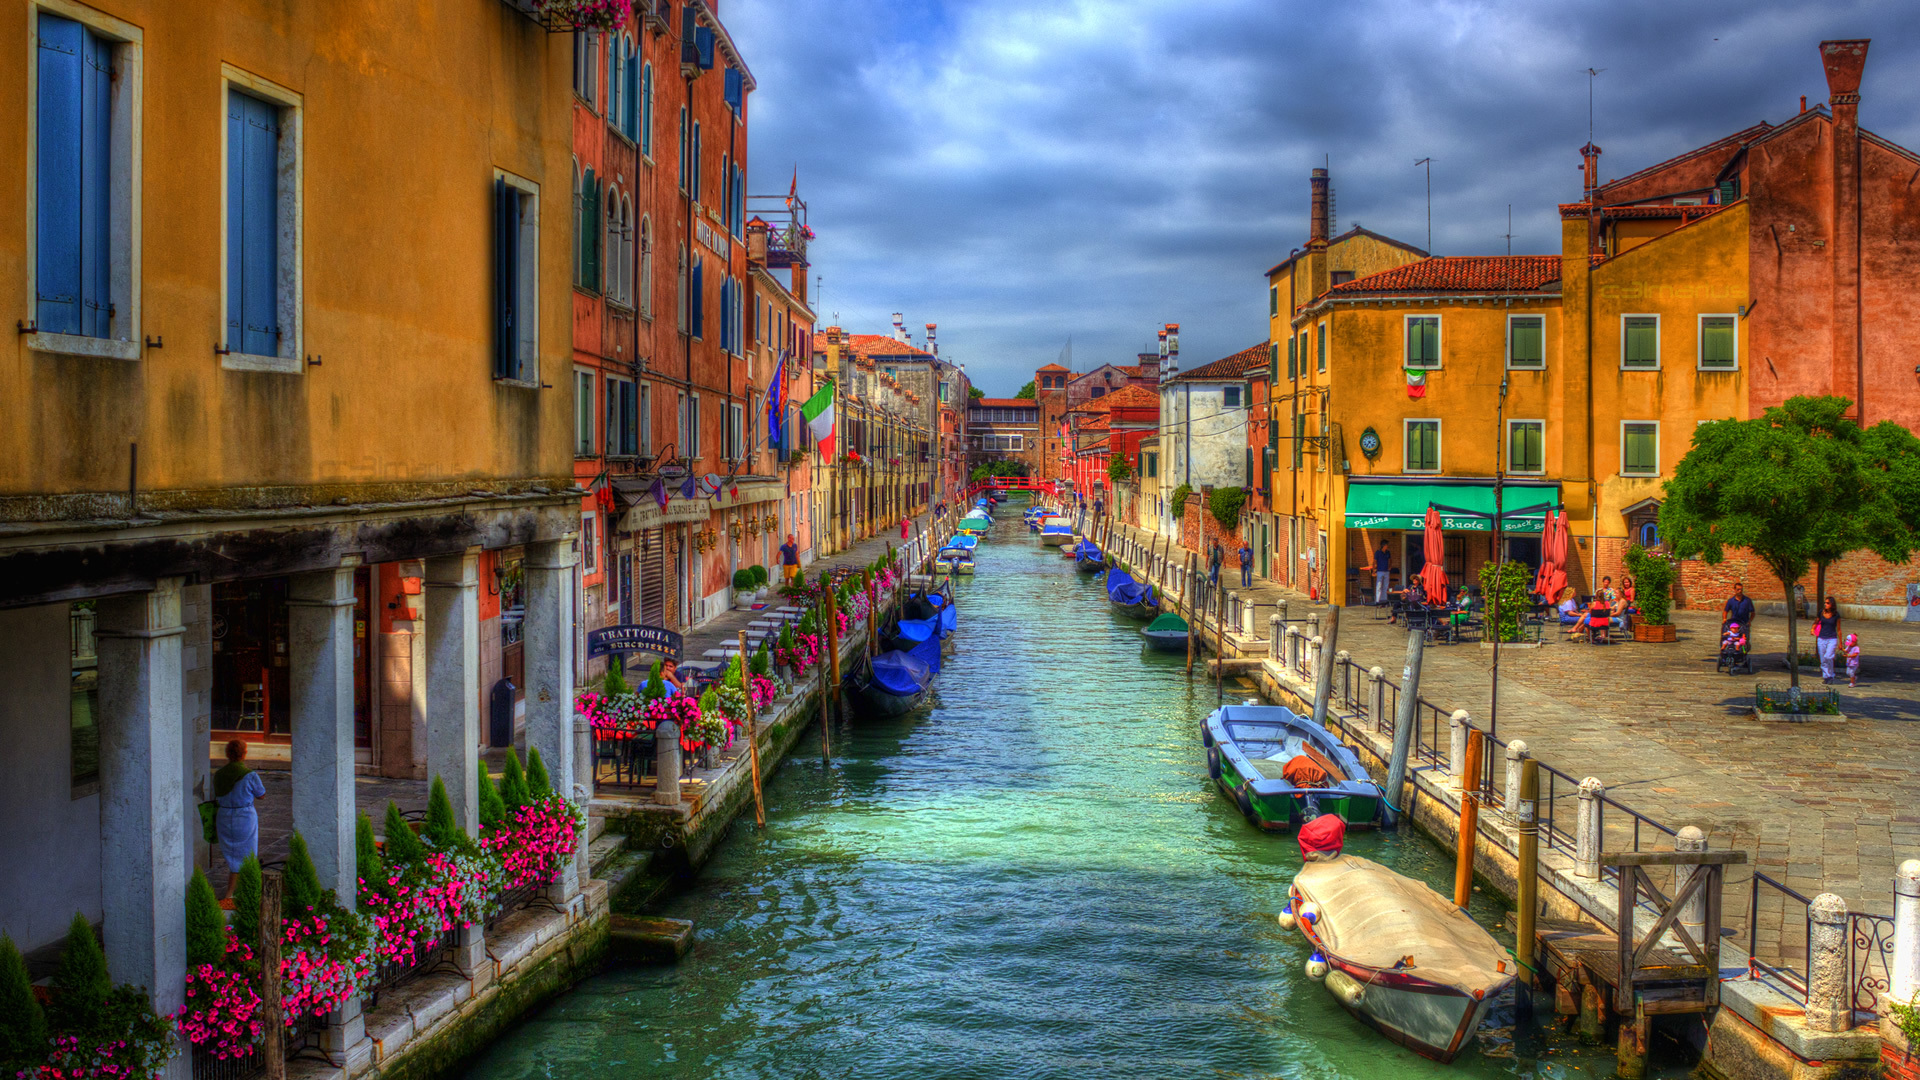 Venice wallpaper 1920x1080 51233 1920x1080